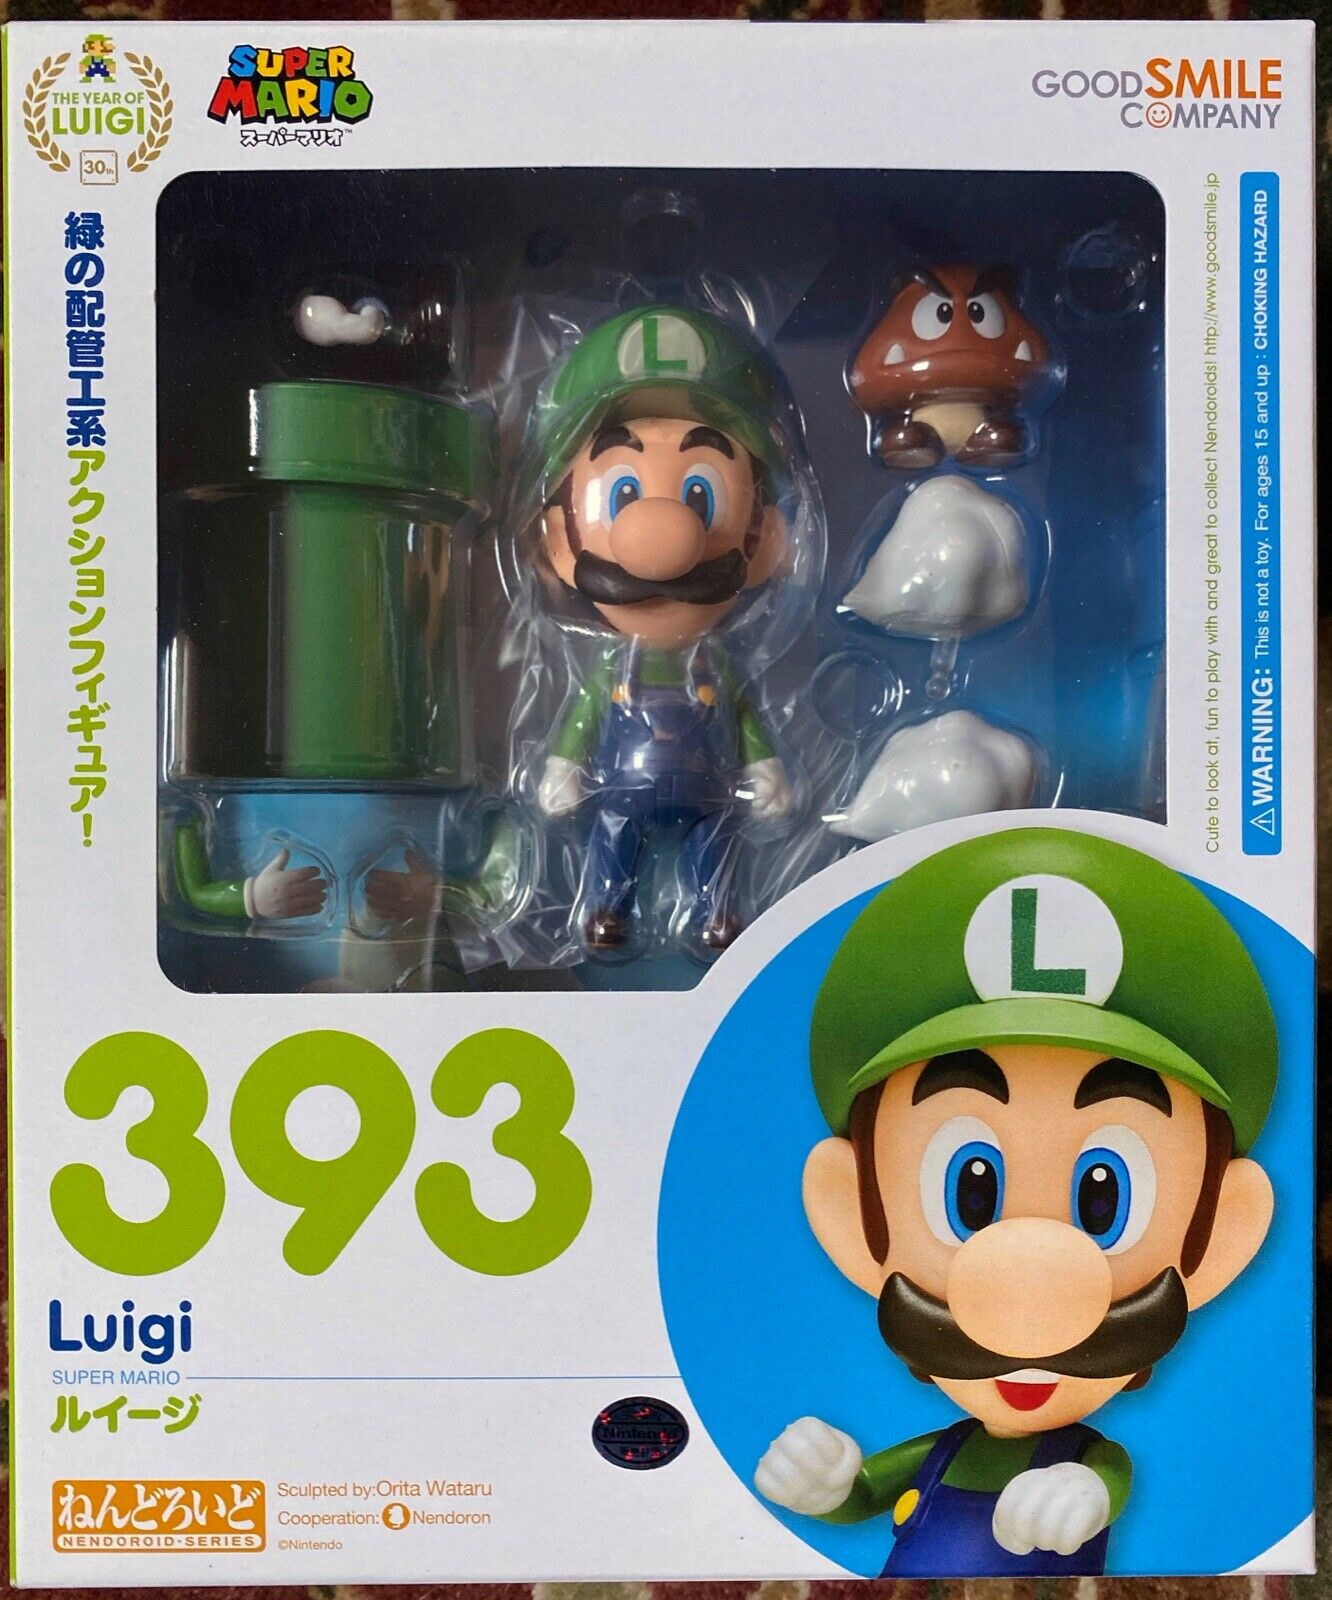 Nendoroid 393 Luigi Super Mario Anime Action Figure Good Smile Action Figure KO